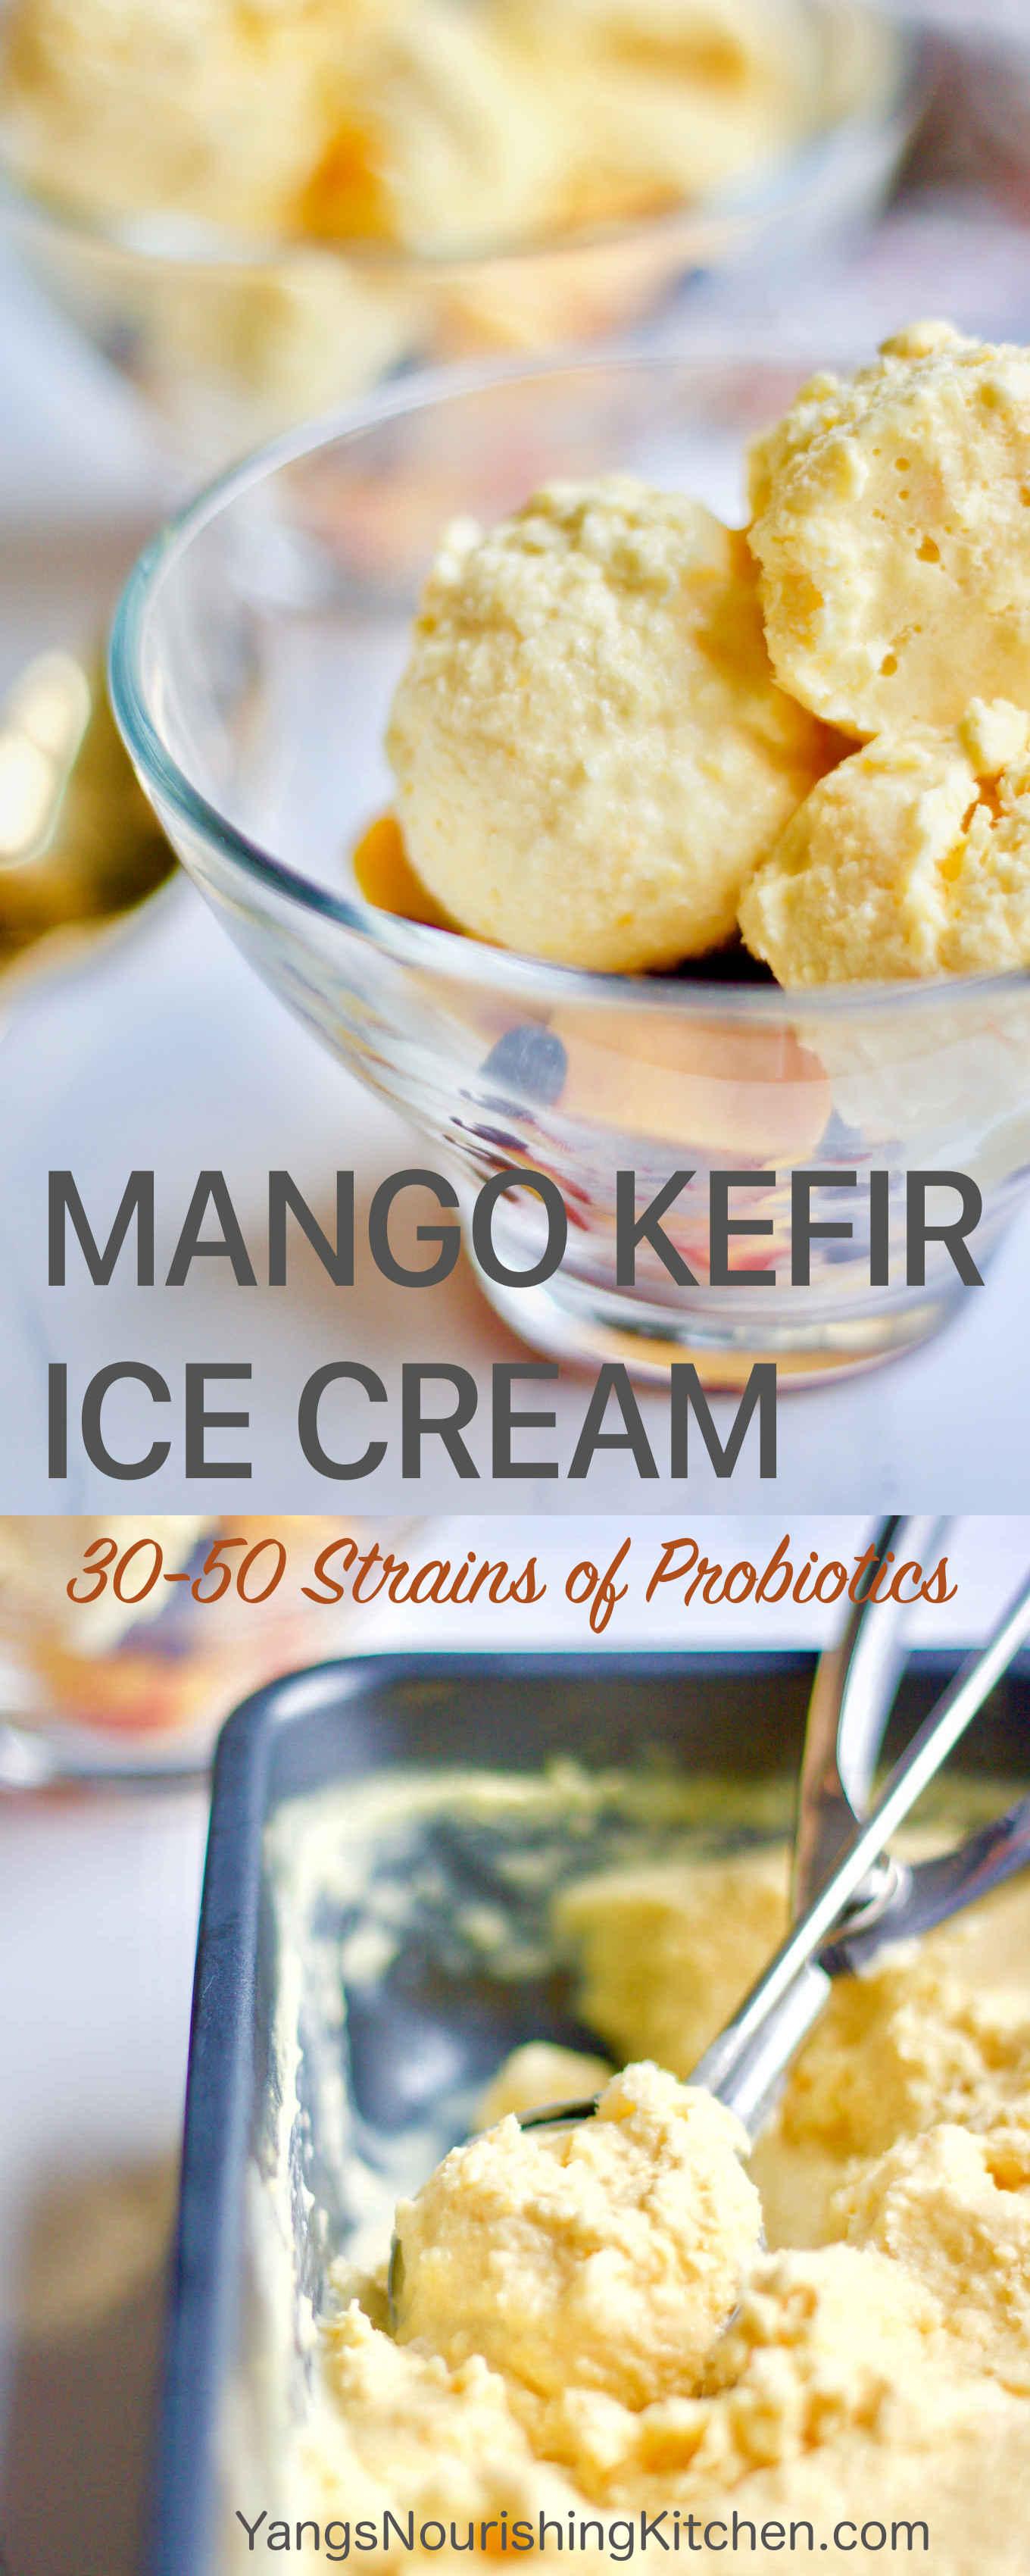 Mango Kefir Ice Cream w/o Ice Cream Maker